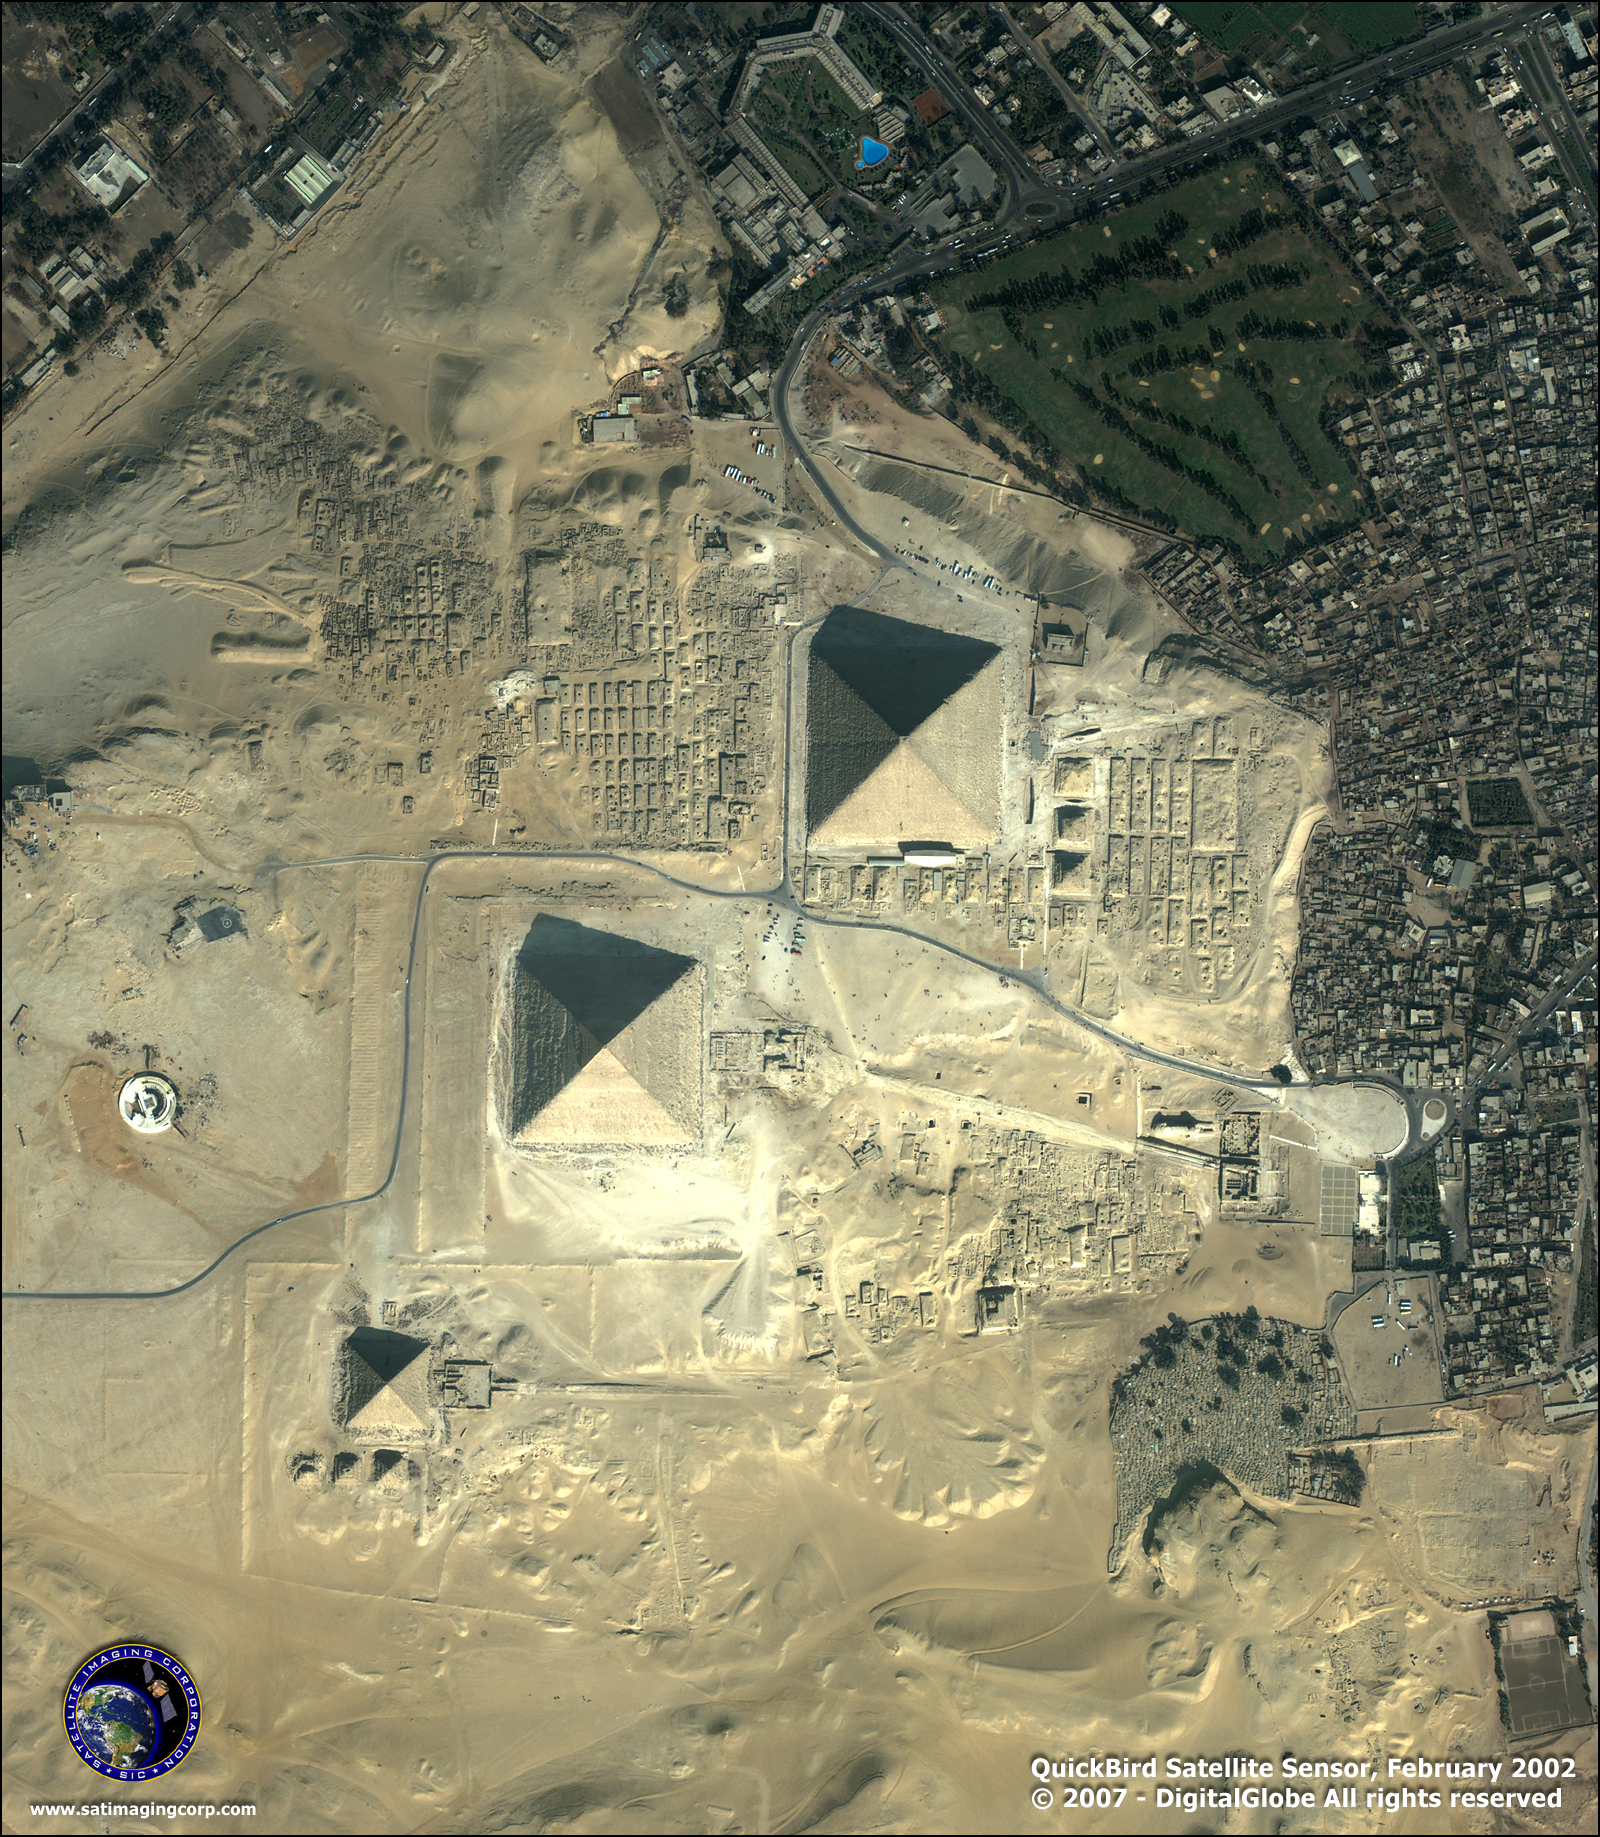 http://www.satimagingcorp.com/galleryimages/quickbird-pyramids-egypt.jpg